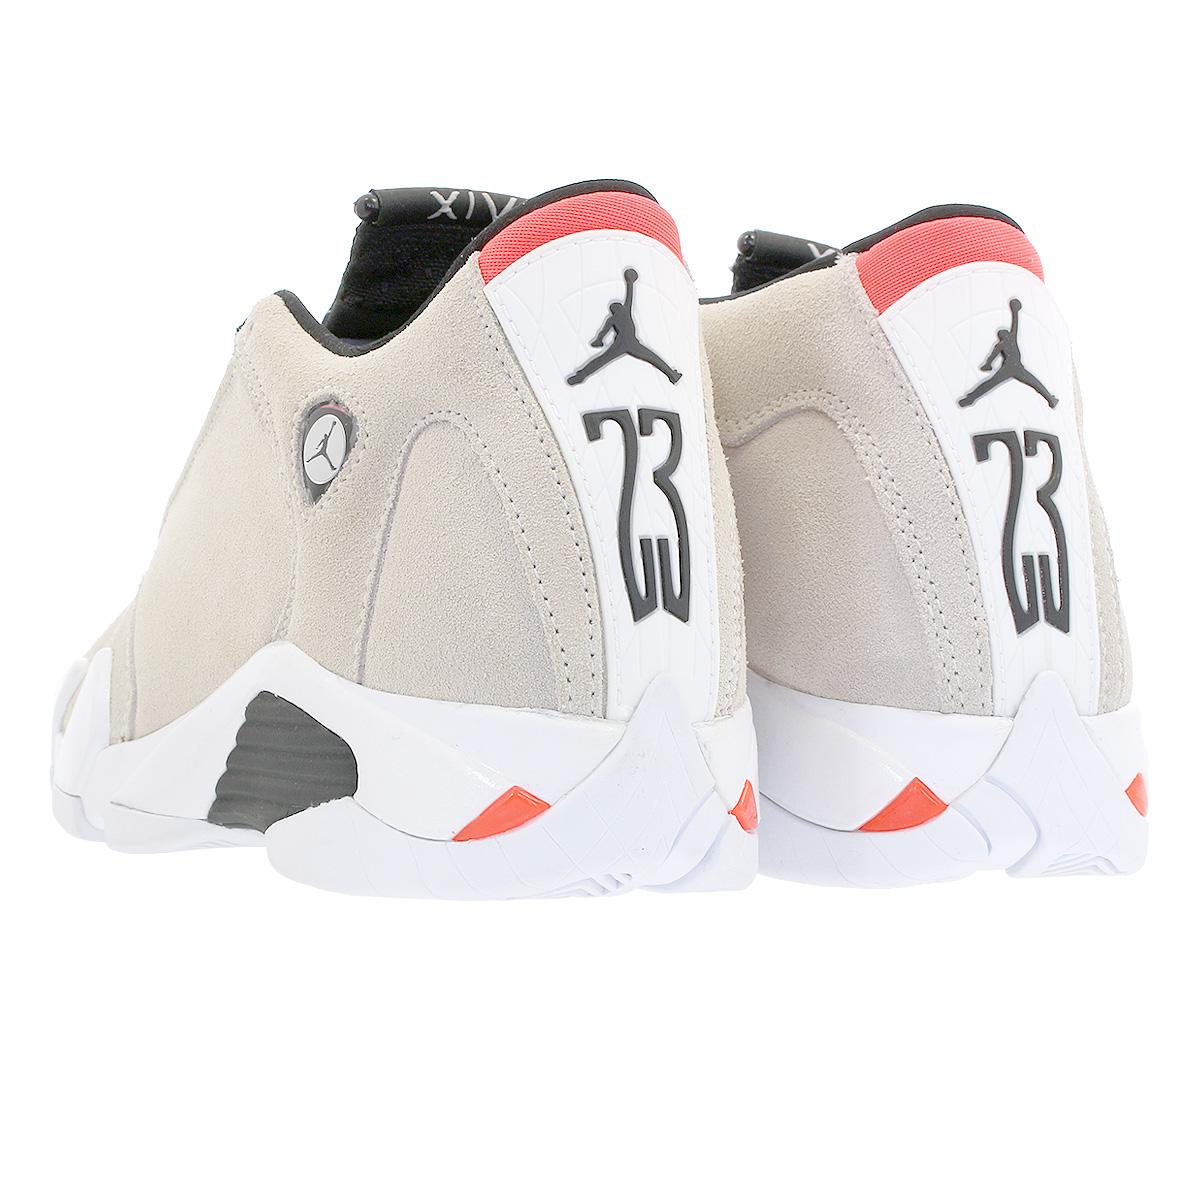 hot sale online dea63 3b3b5 NIKE AIR JORDAN 14 RETRO BG Nike Air Jordan 14 nostalgic BG DESERT  SAND/BLACK/WHITE/INFRARED 23 487,524-021